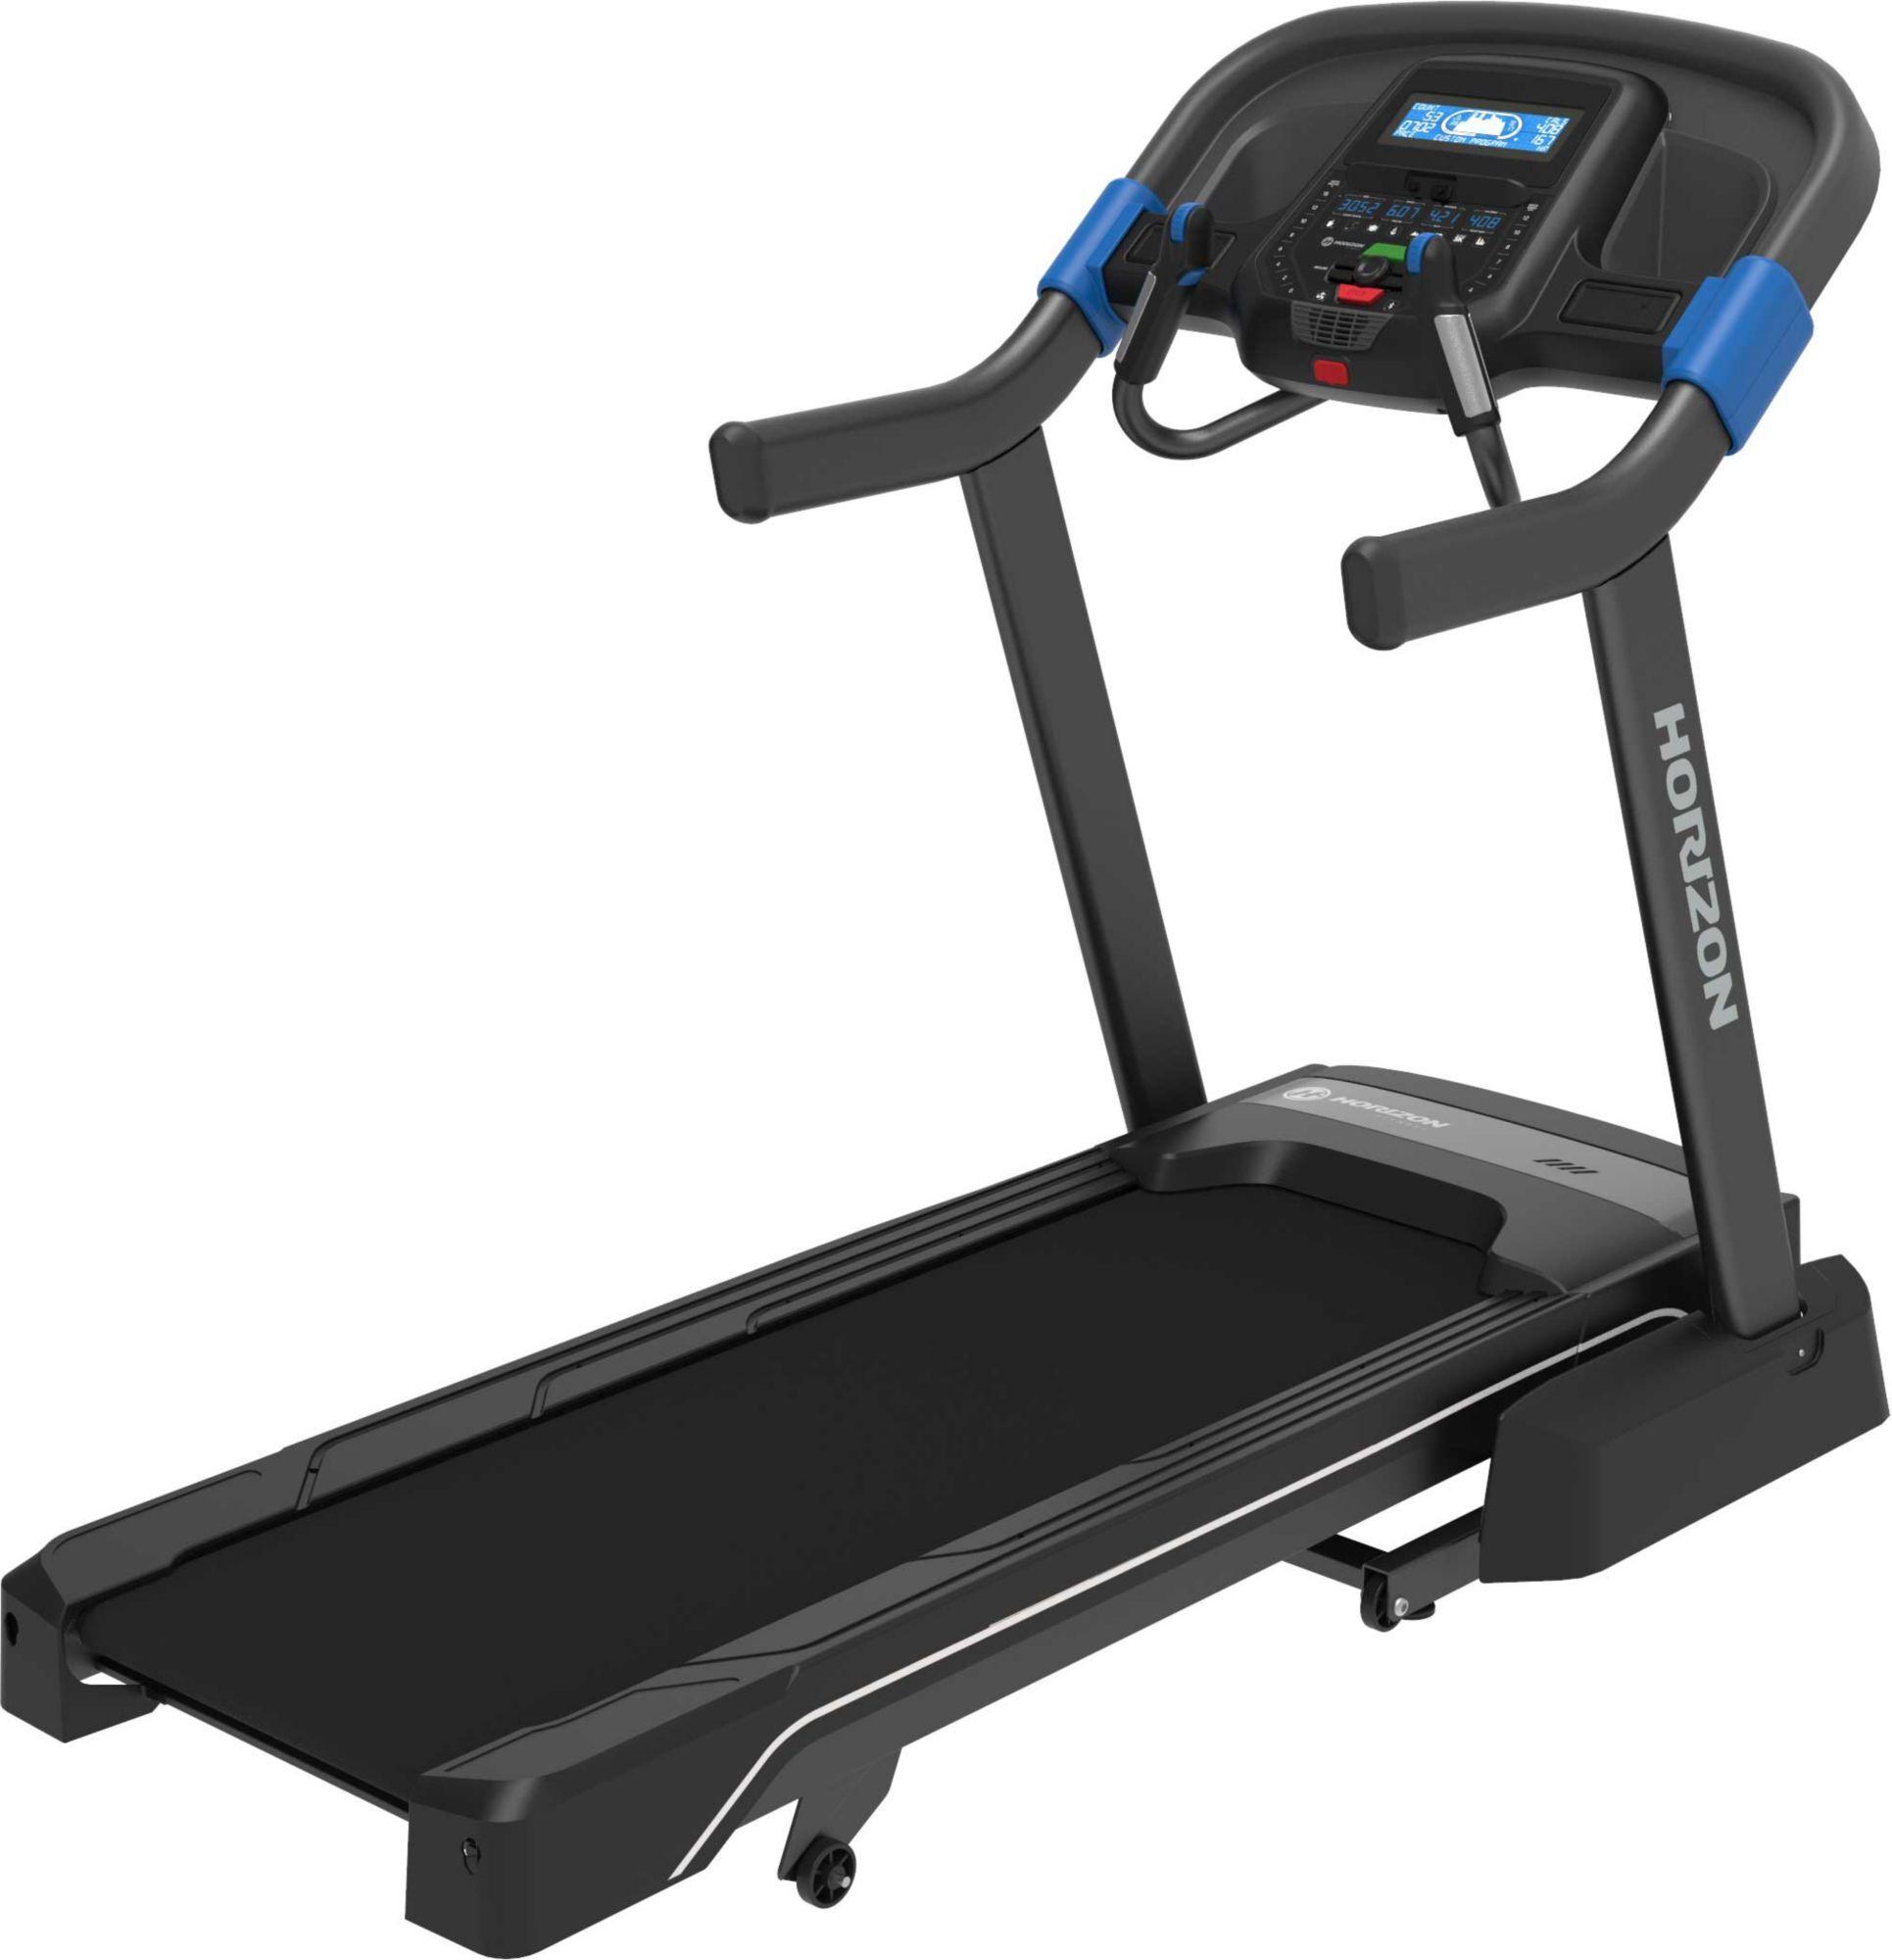 Horizon Fitness 7.0 AT Studio Series Treadmill